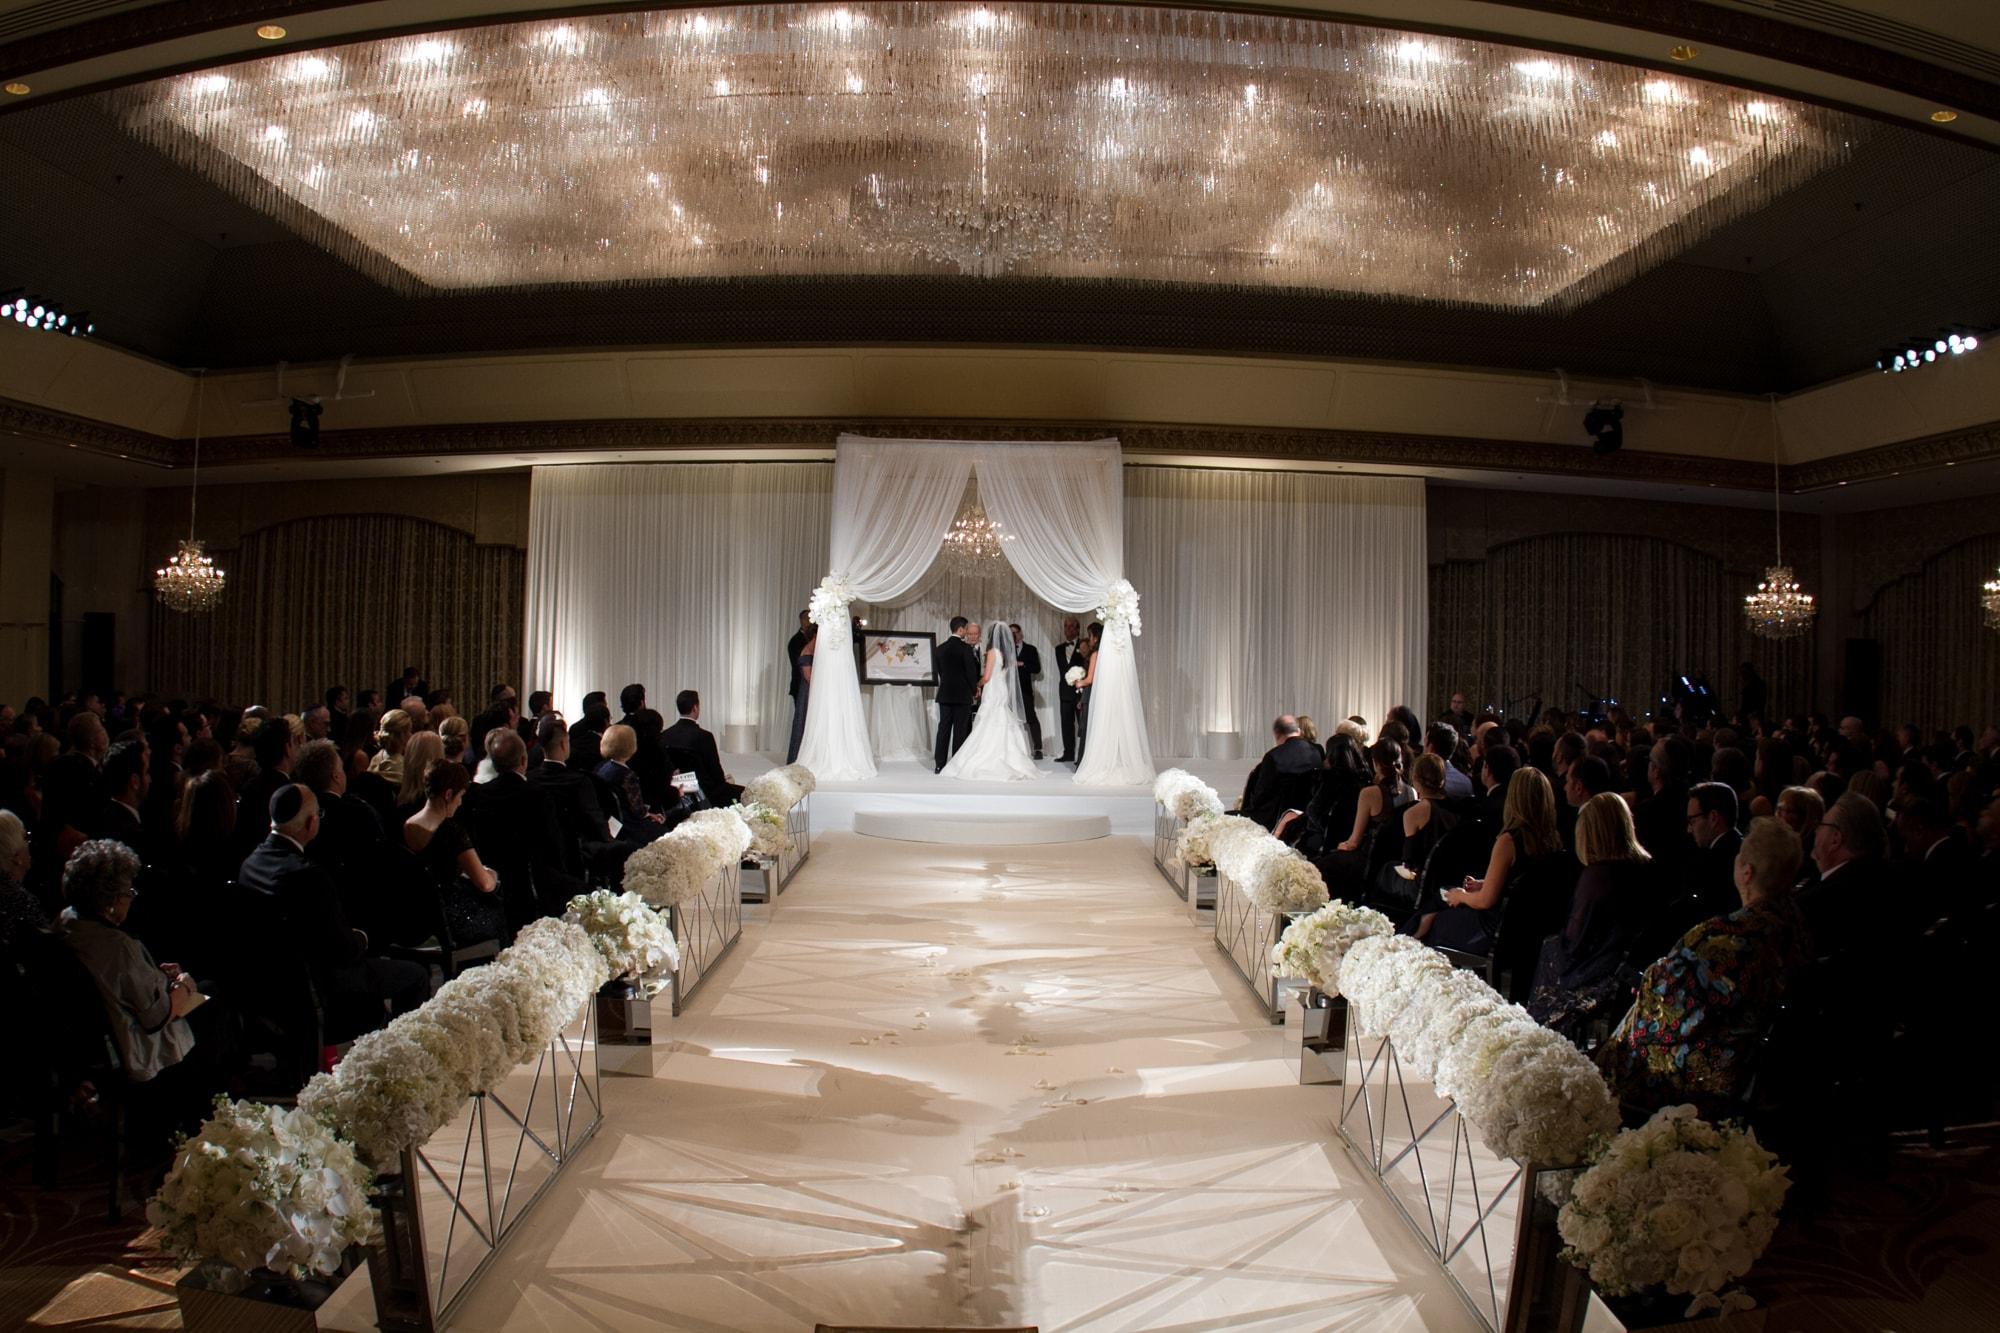 Romantic wedding ceremony at the Ritz Carlton Chicago